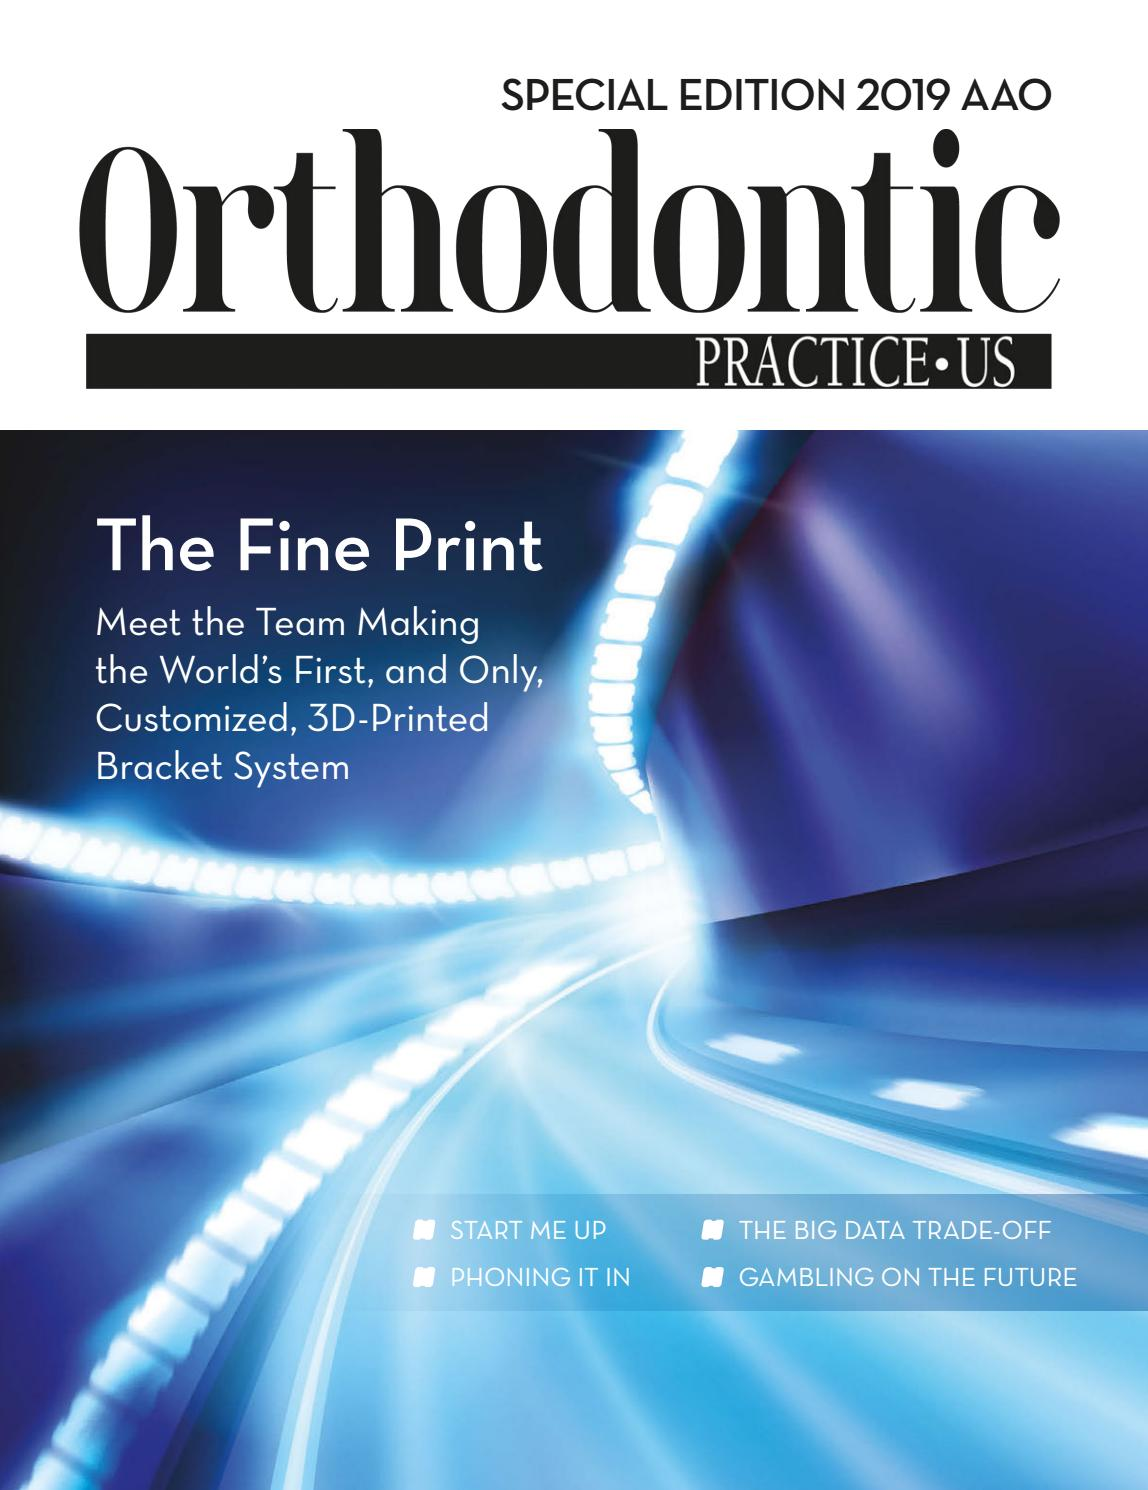 b1c1532a0 Orthodontic Practice US - AAO 2019 LightForce Supplement by MedMark ...